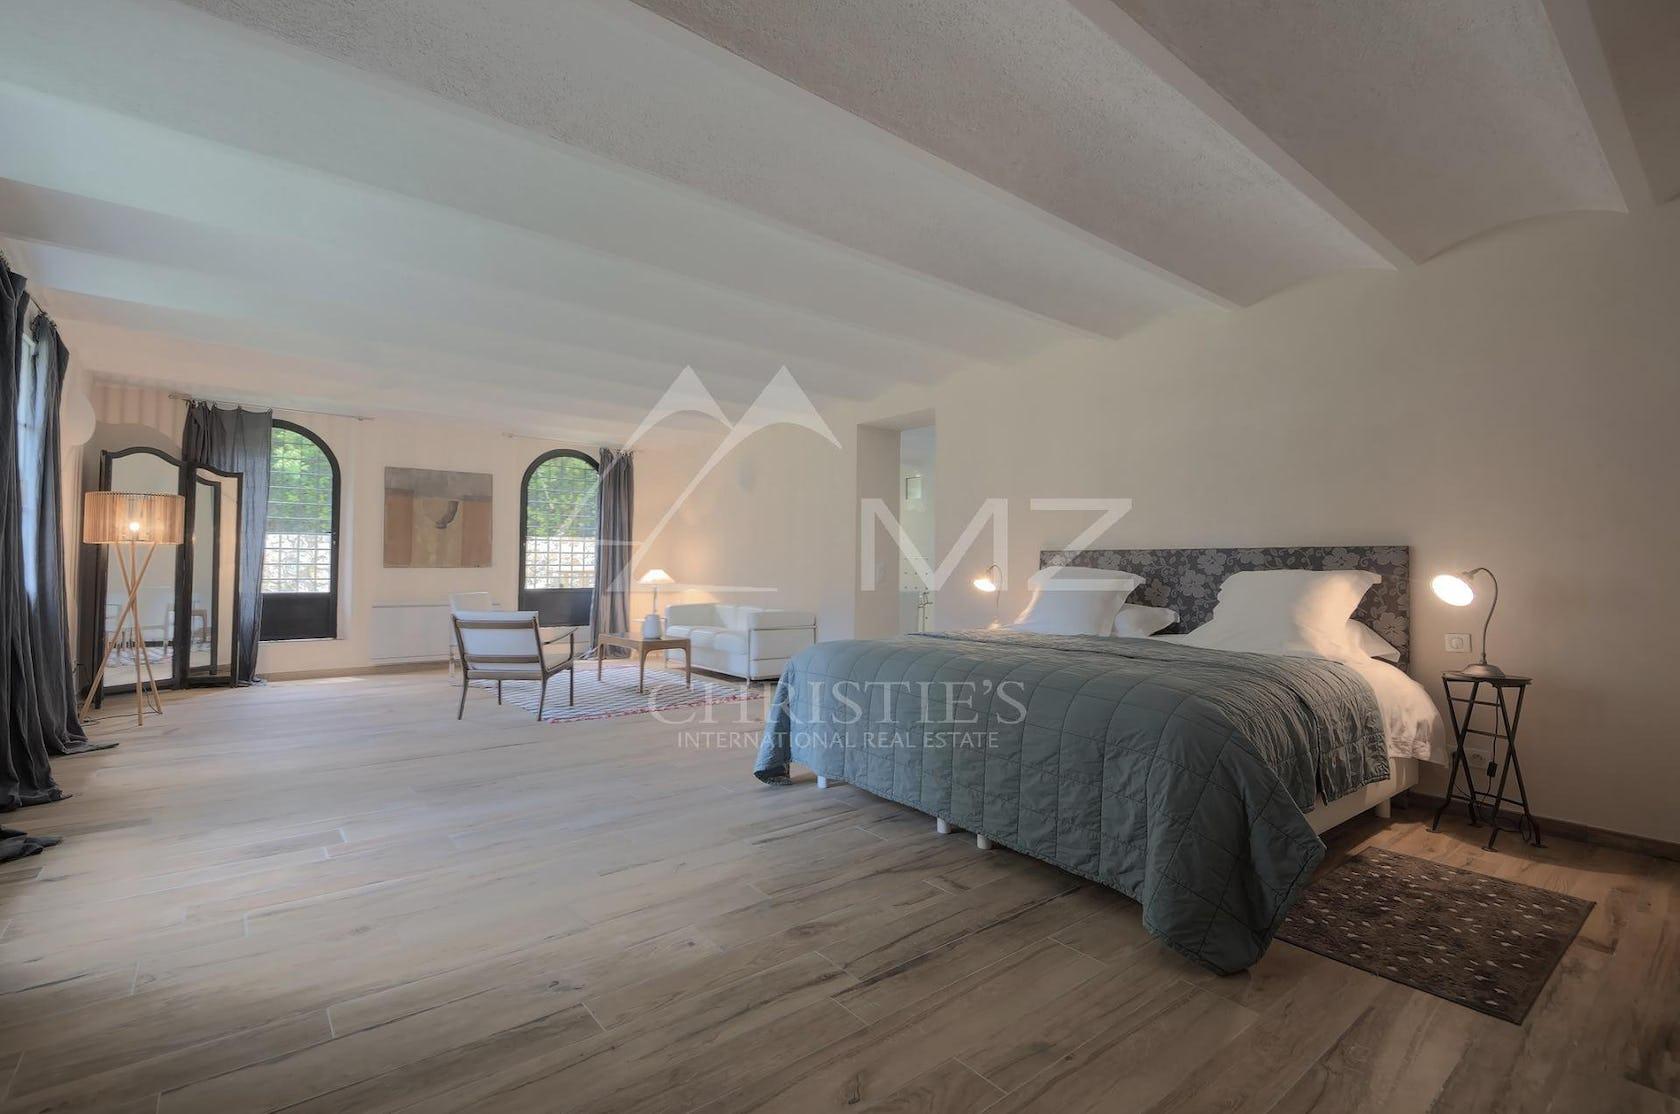 flooring floor wood hardwood interior design indoors bed furniture room